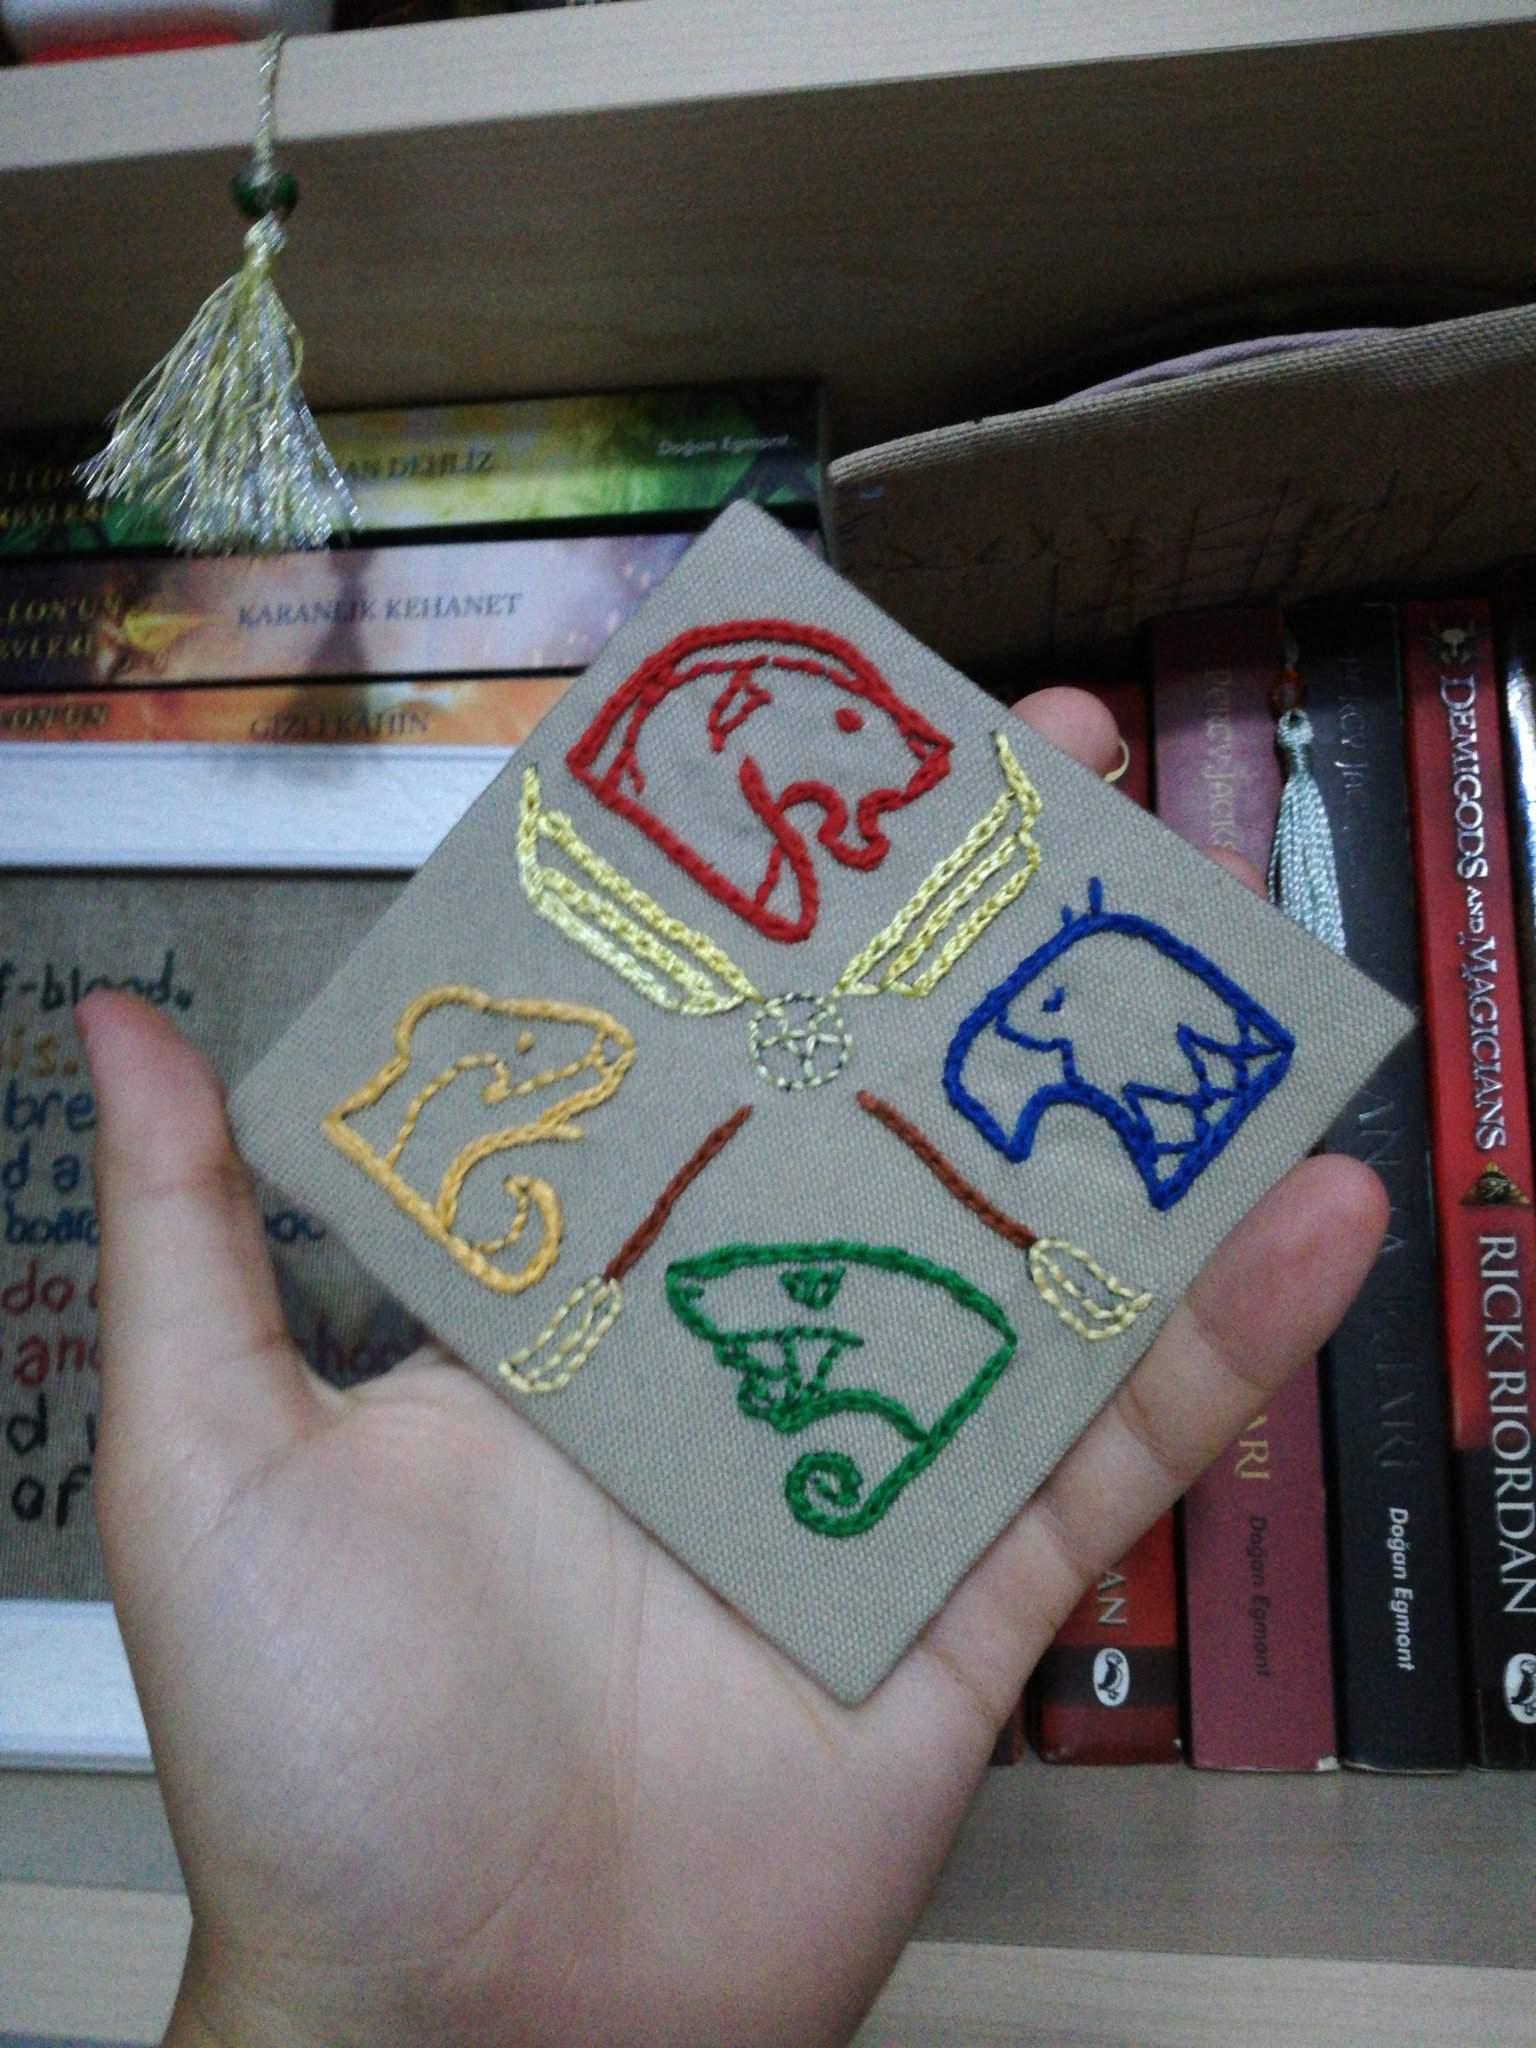 Keranet Come Si Usa.Hogwarts Logo Embroidery Thing Harry Potter Amino